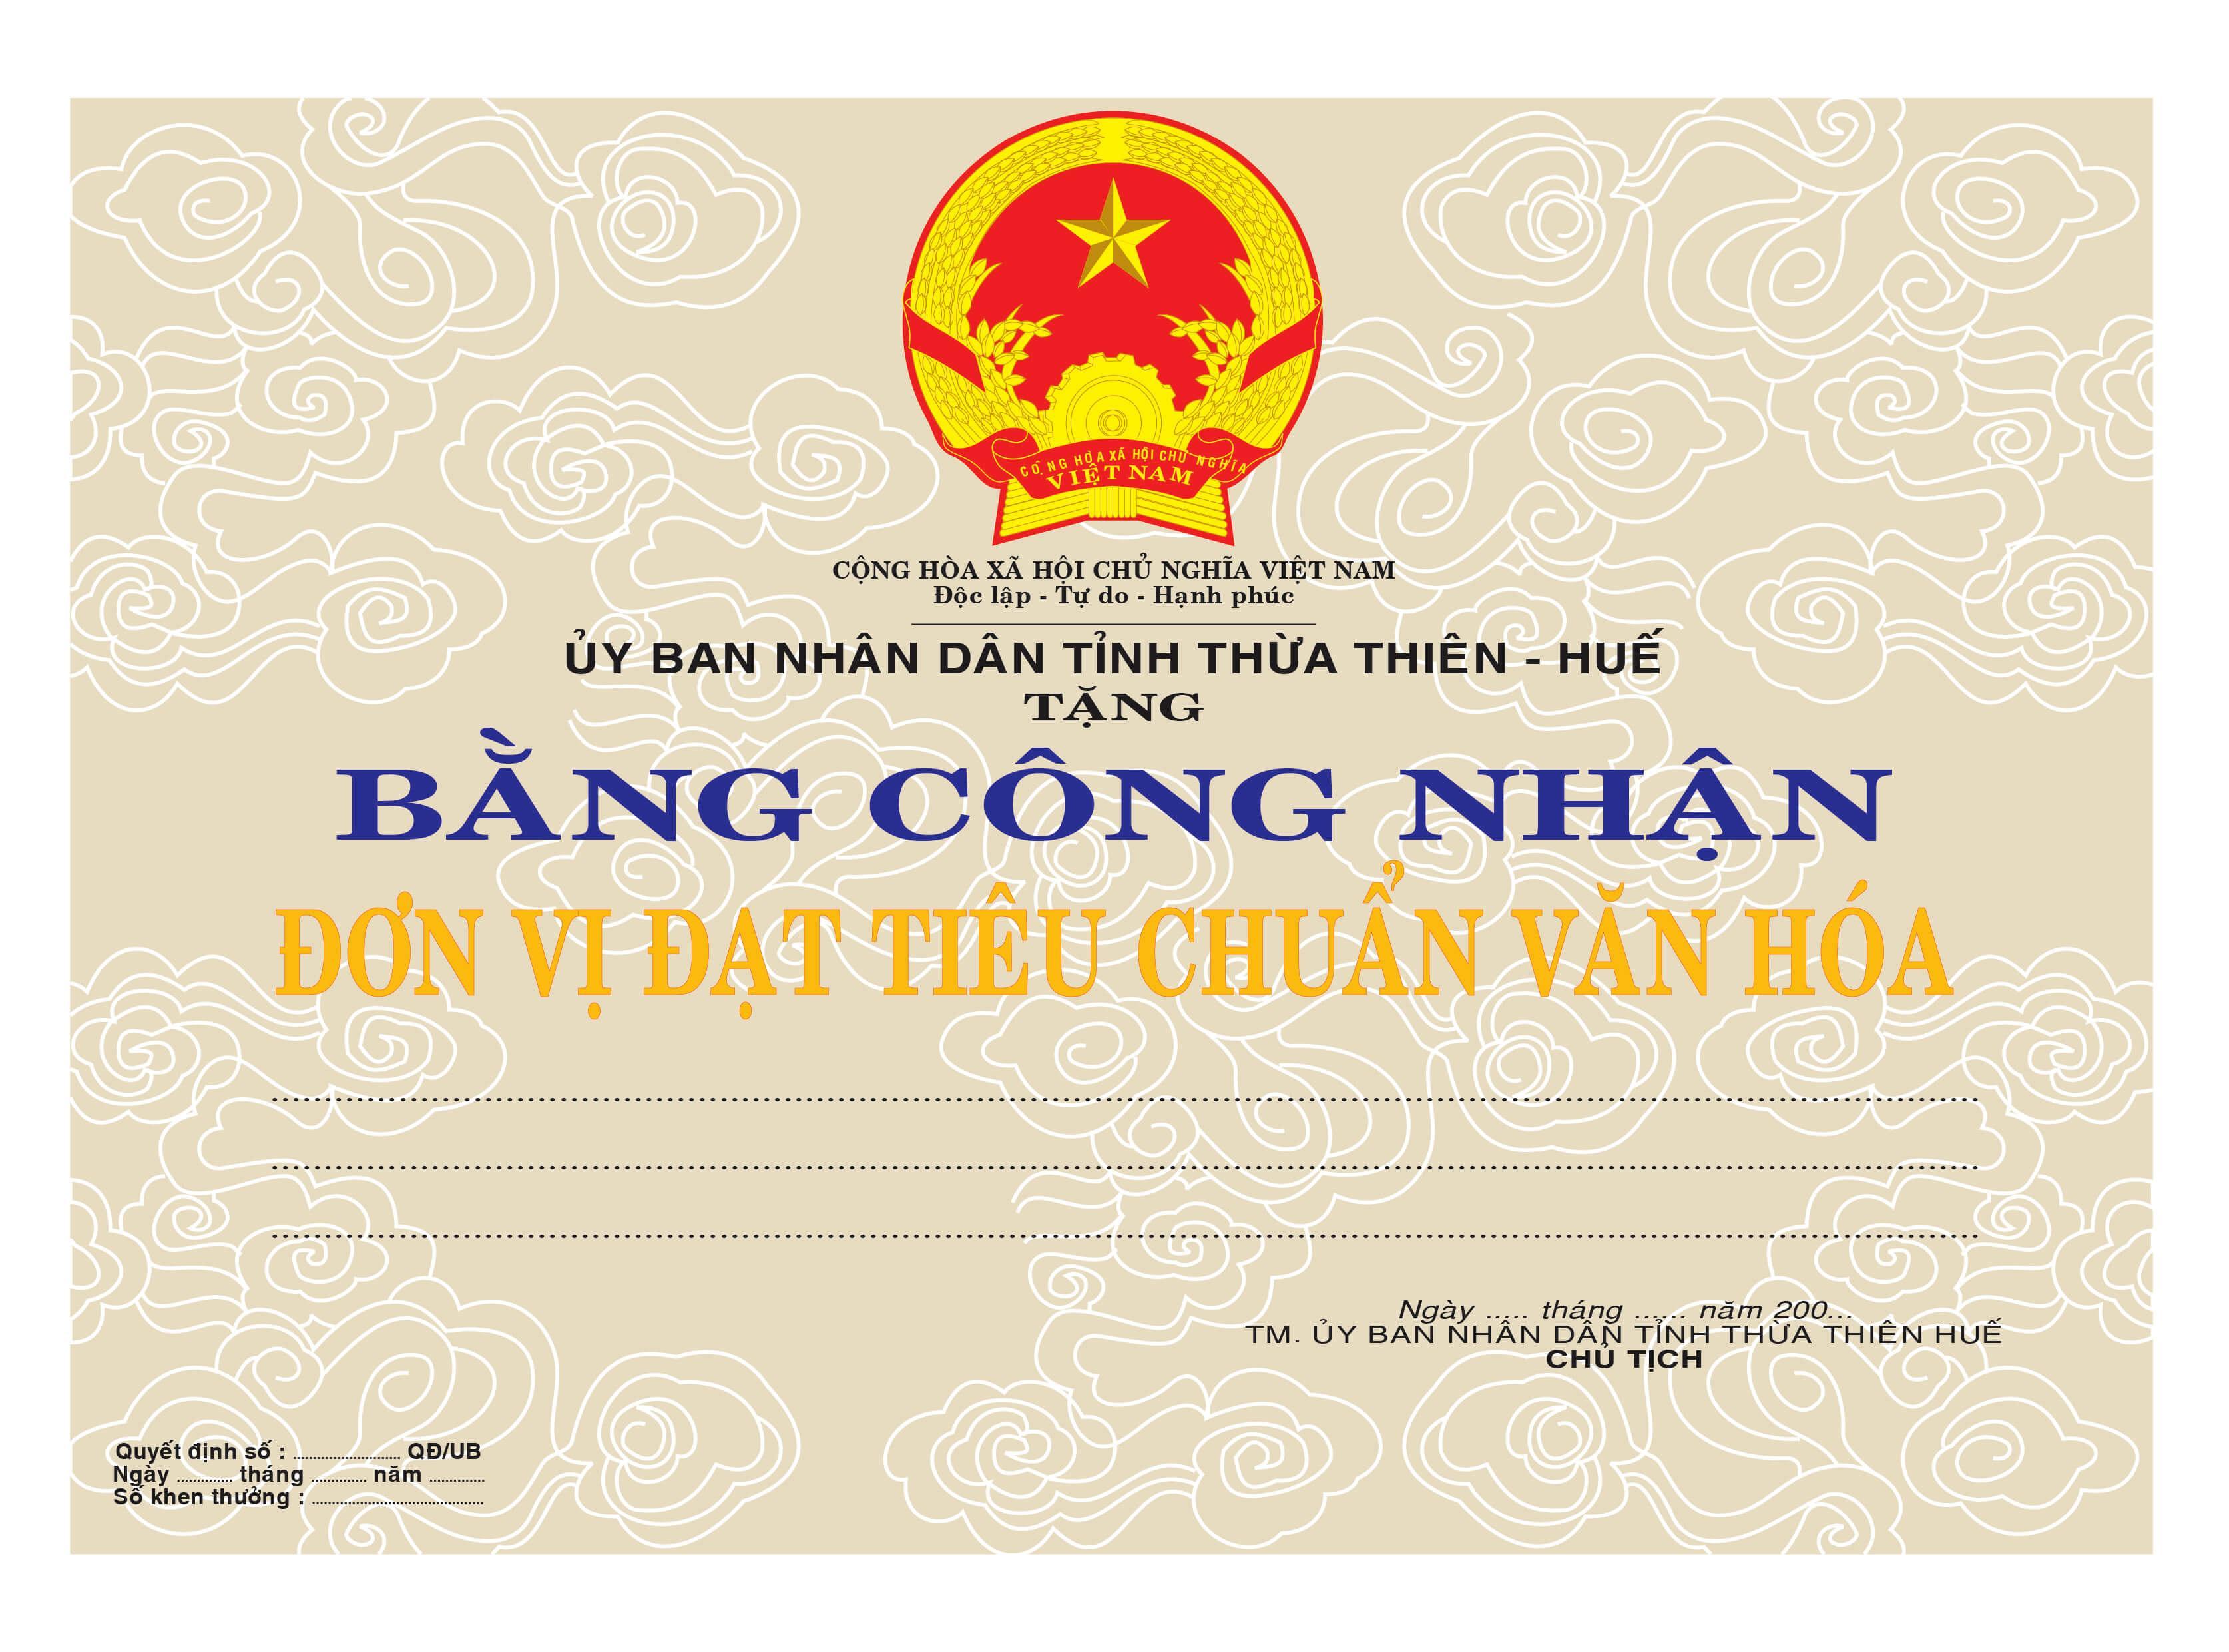 Mẫu giấy khen 057 - Giấy khen UBND - link download : https://adsnew.net/G1x4K2